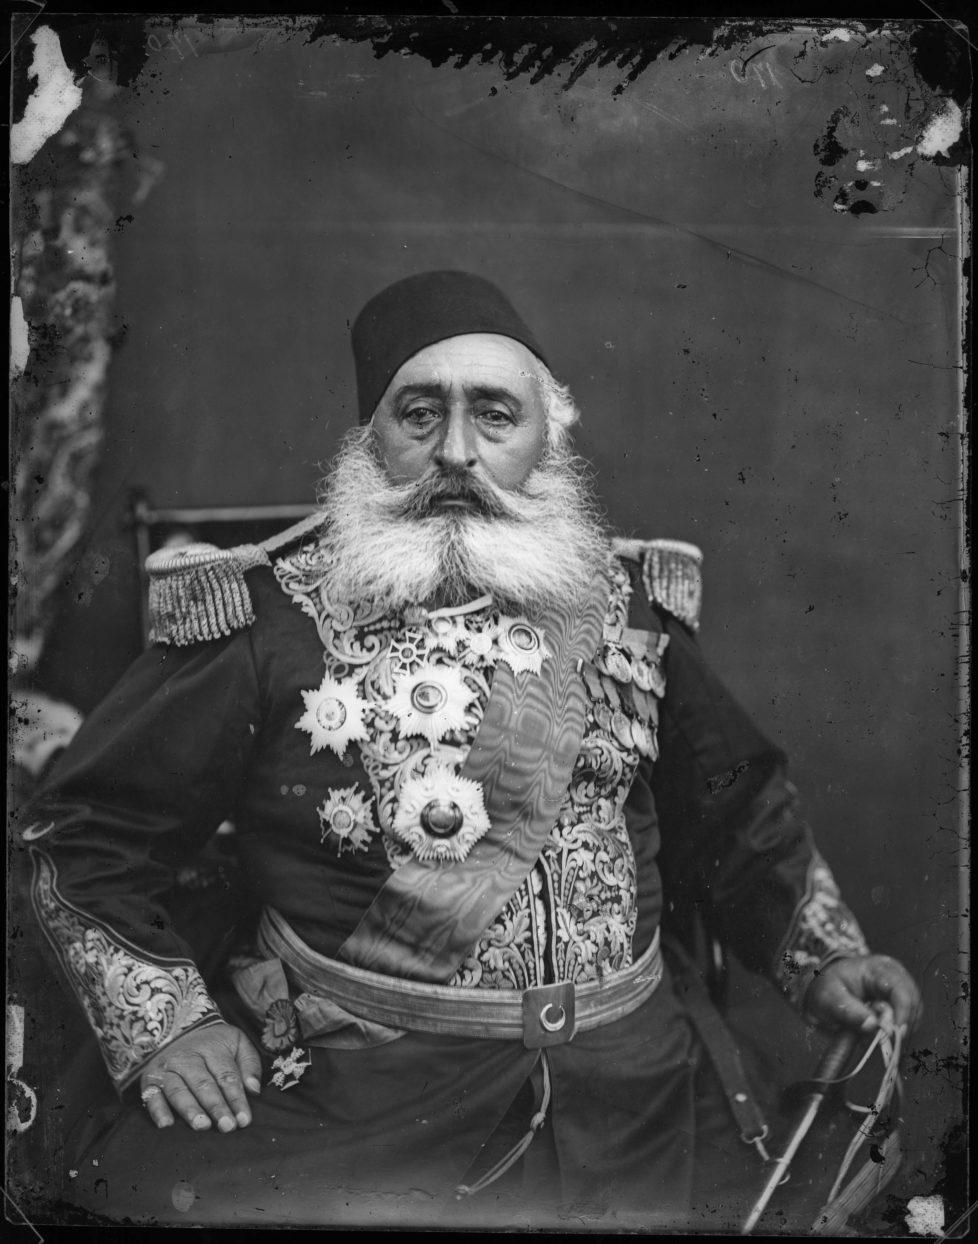 Ismail Pasha, 1875, Pietro Marubi, wet plate © Marubi National Museum of Photography, Shkodër